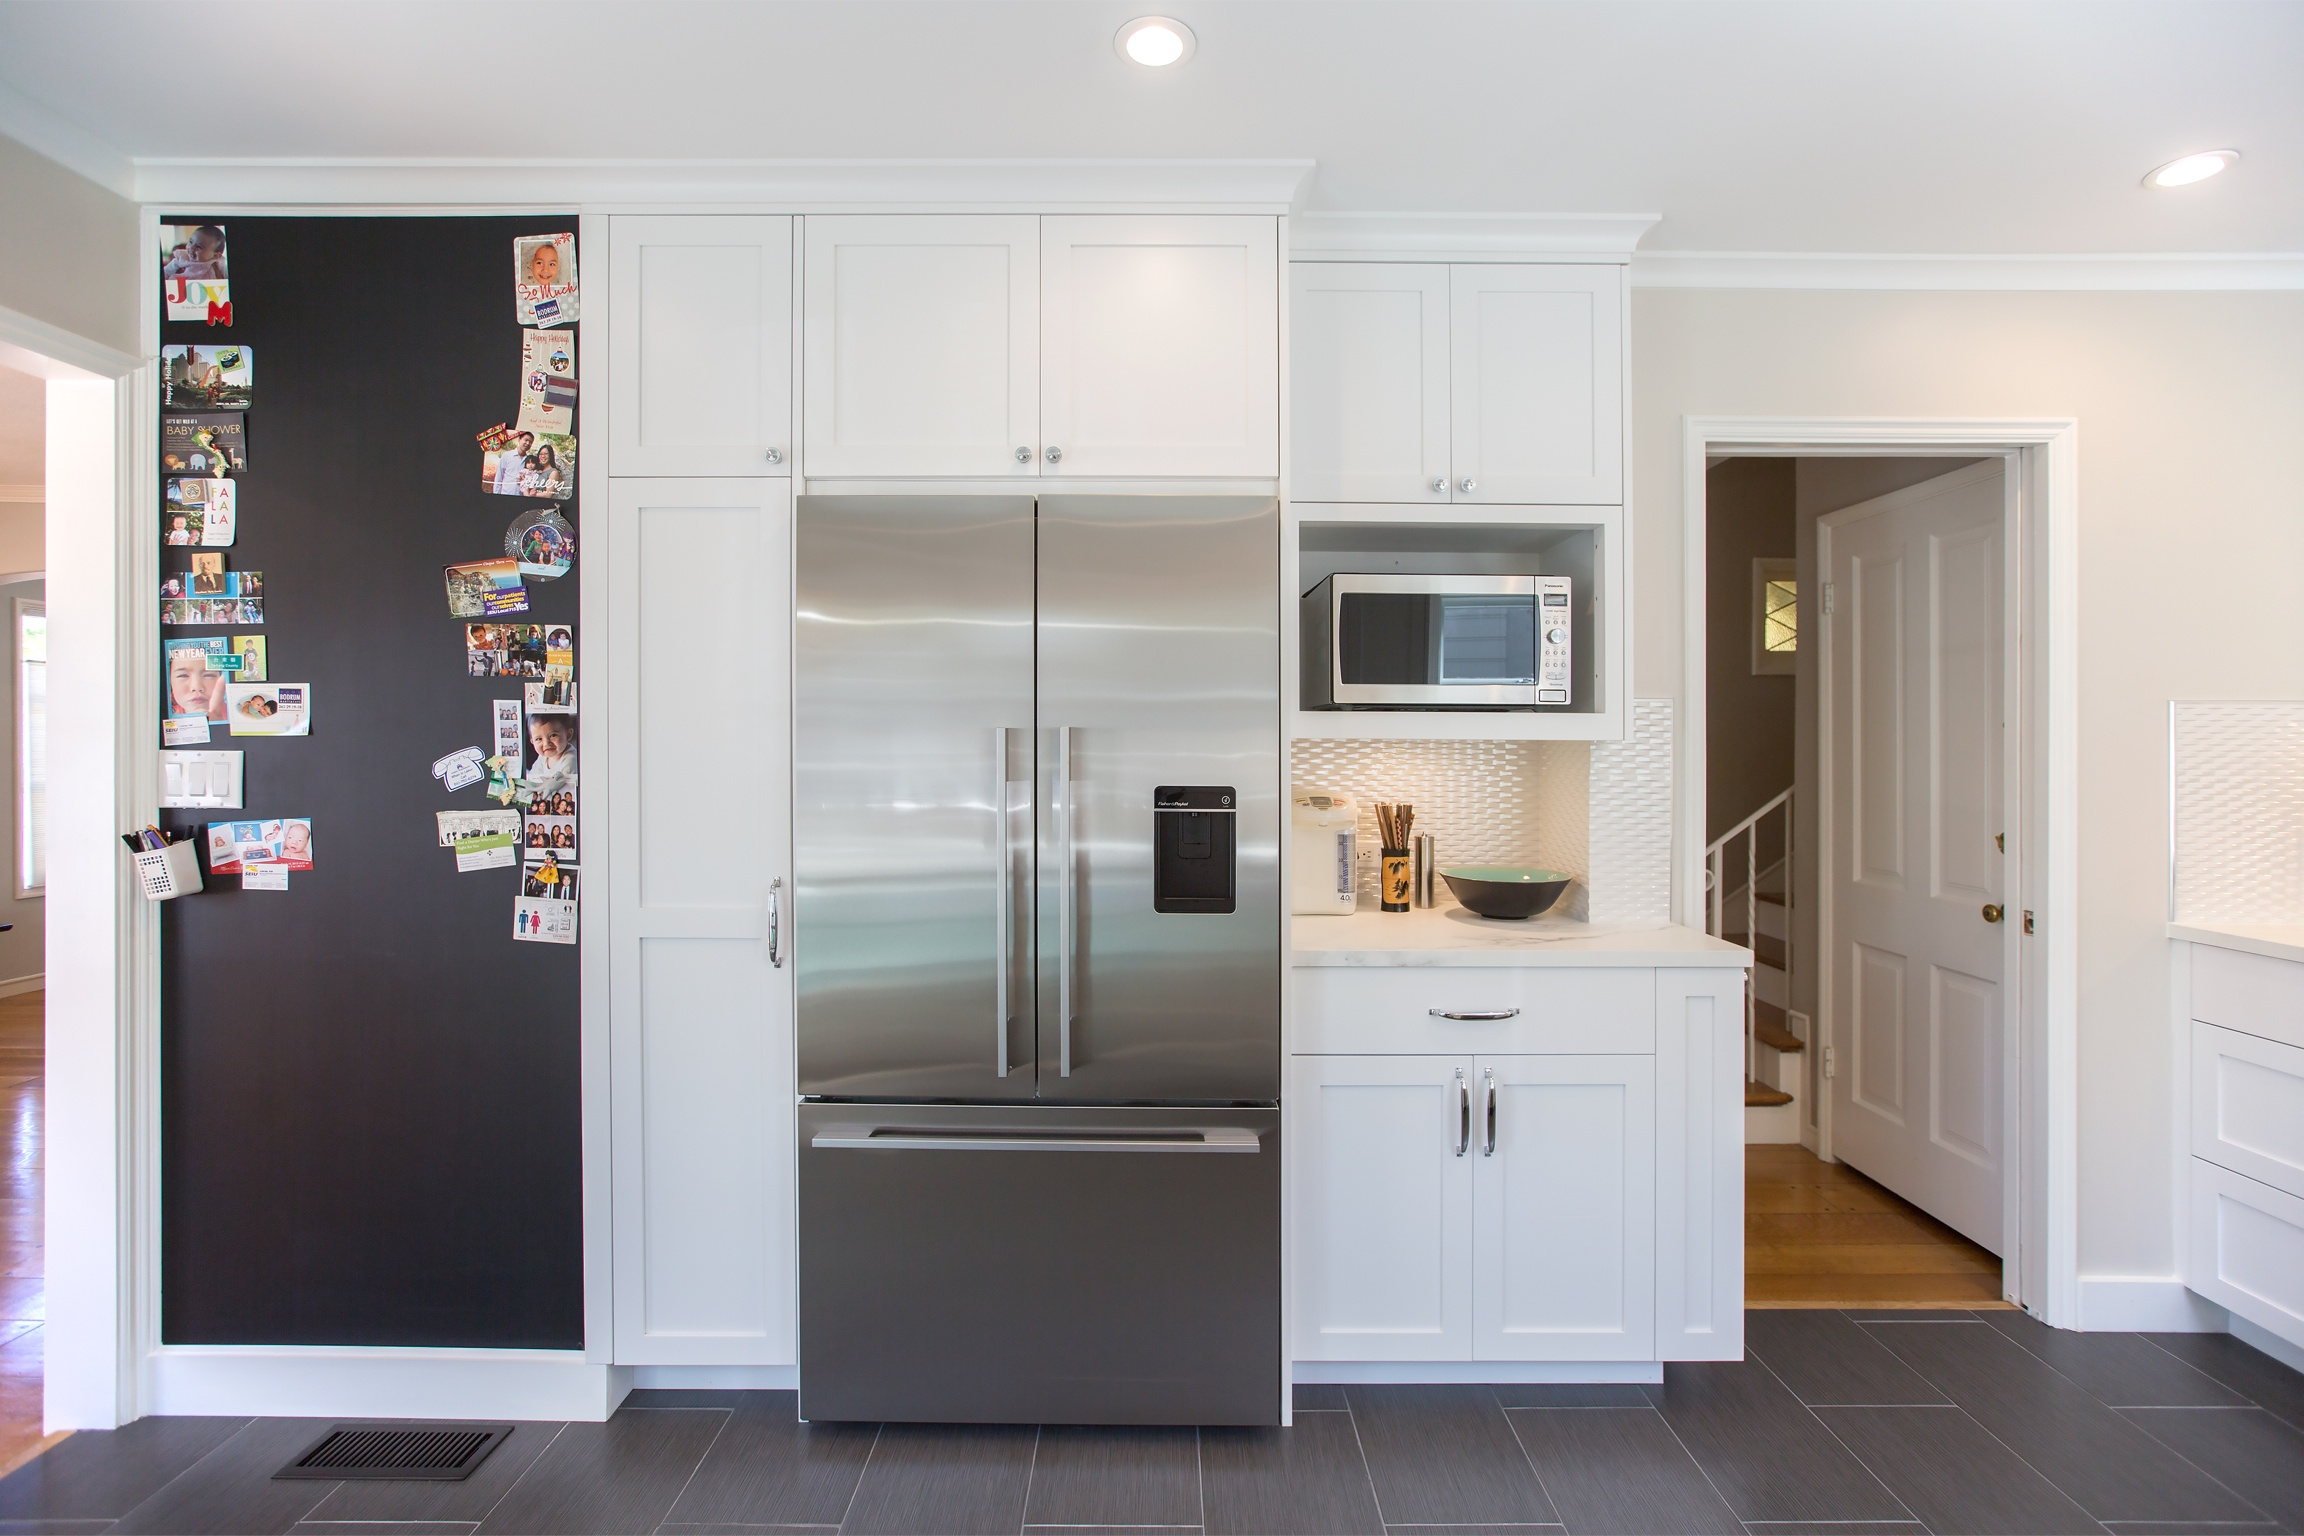 william-adams-design-clement-kitchen-white-cabinets-grey-tile-floors-stainless-steel-refrigerator.jpg